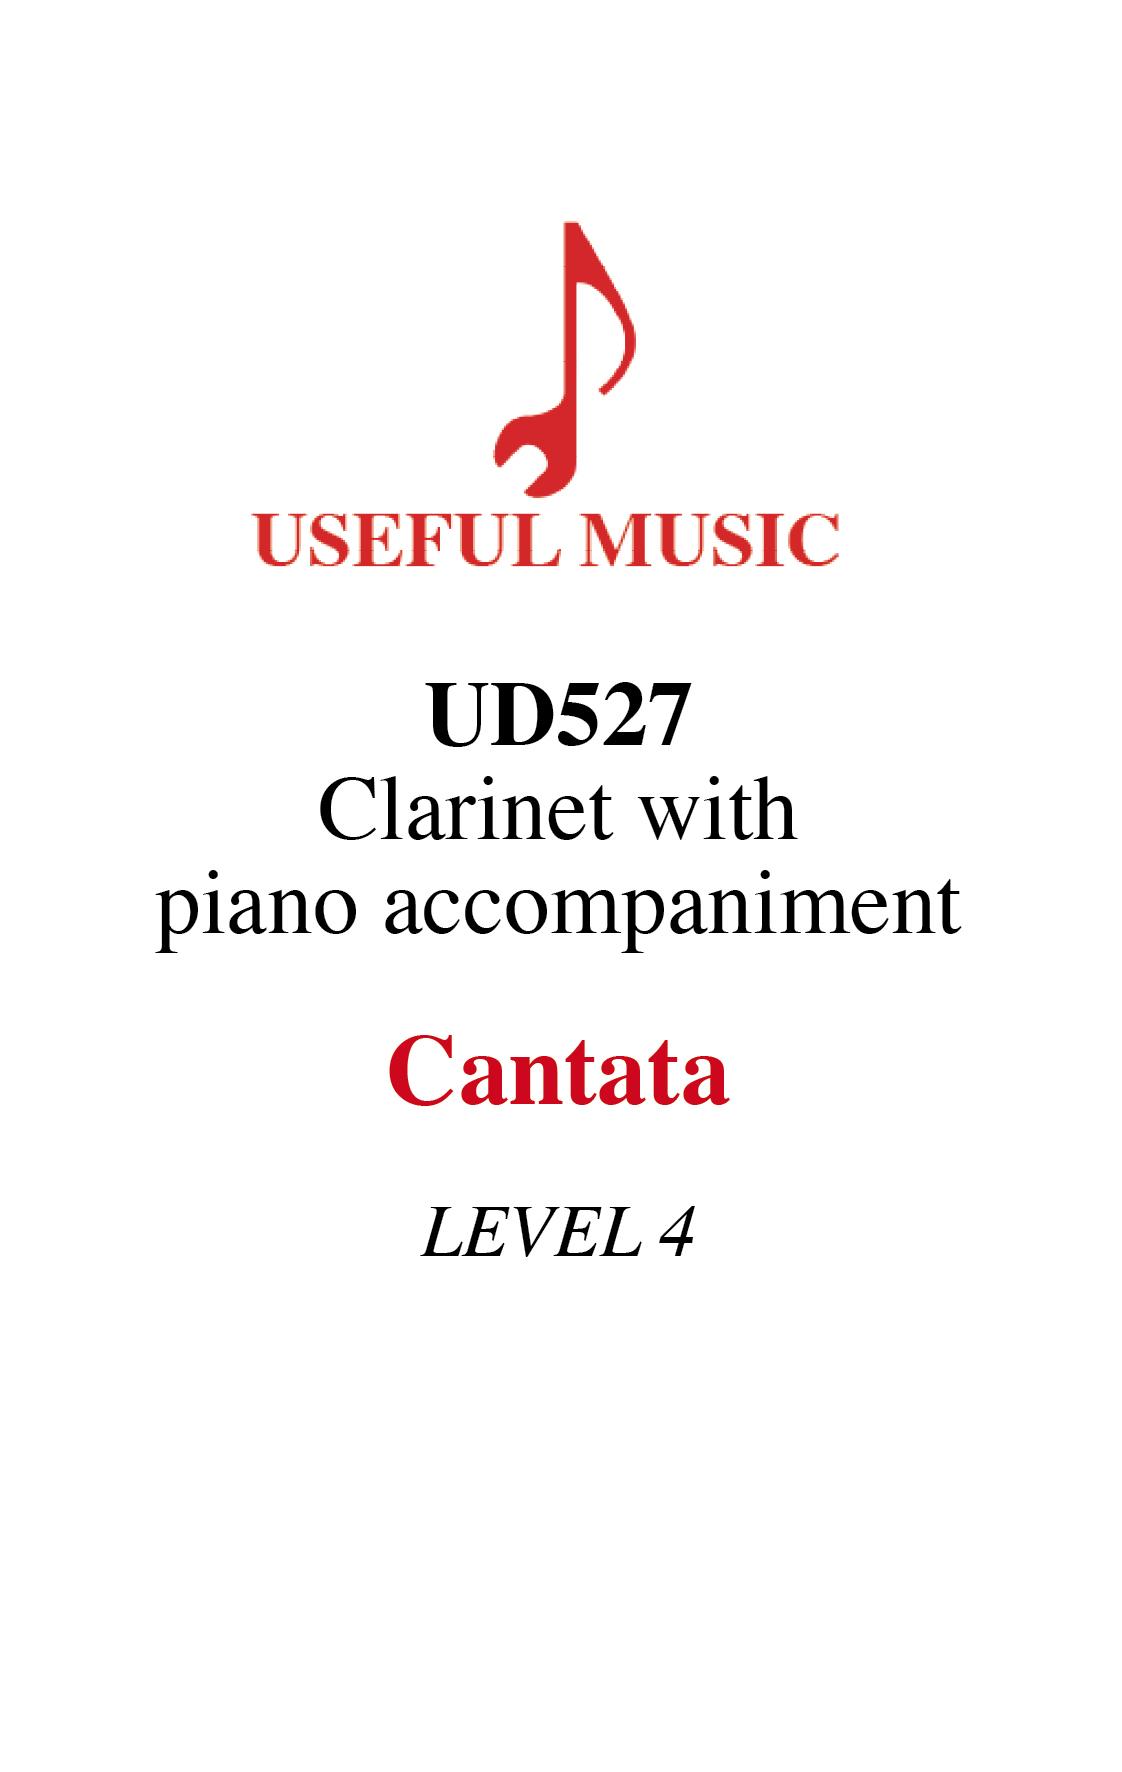 Cantata - Clarinet with piano accompaniment